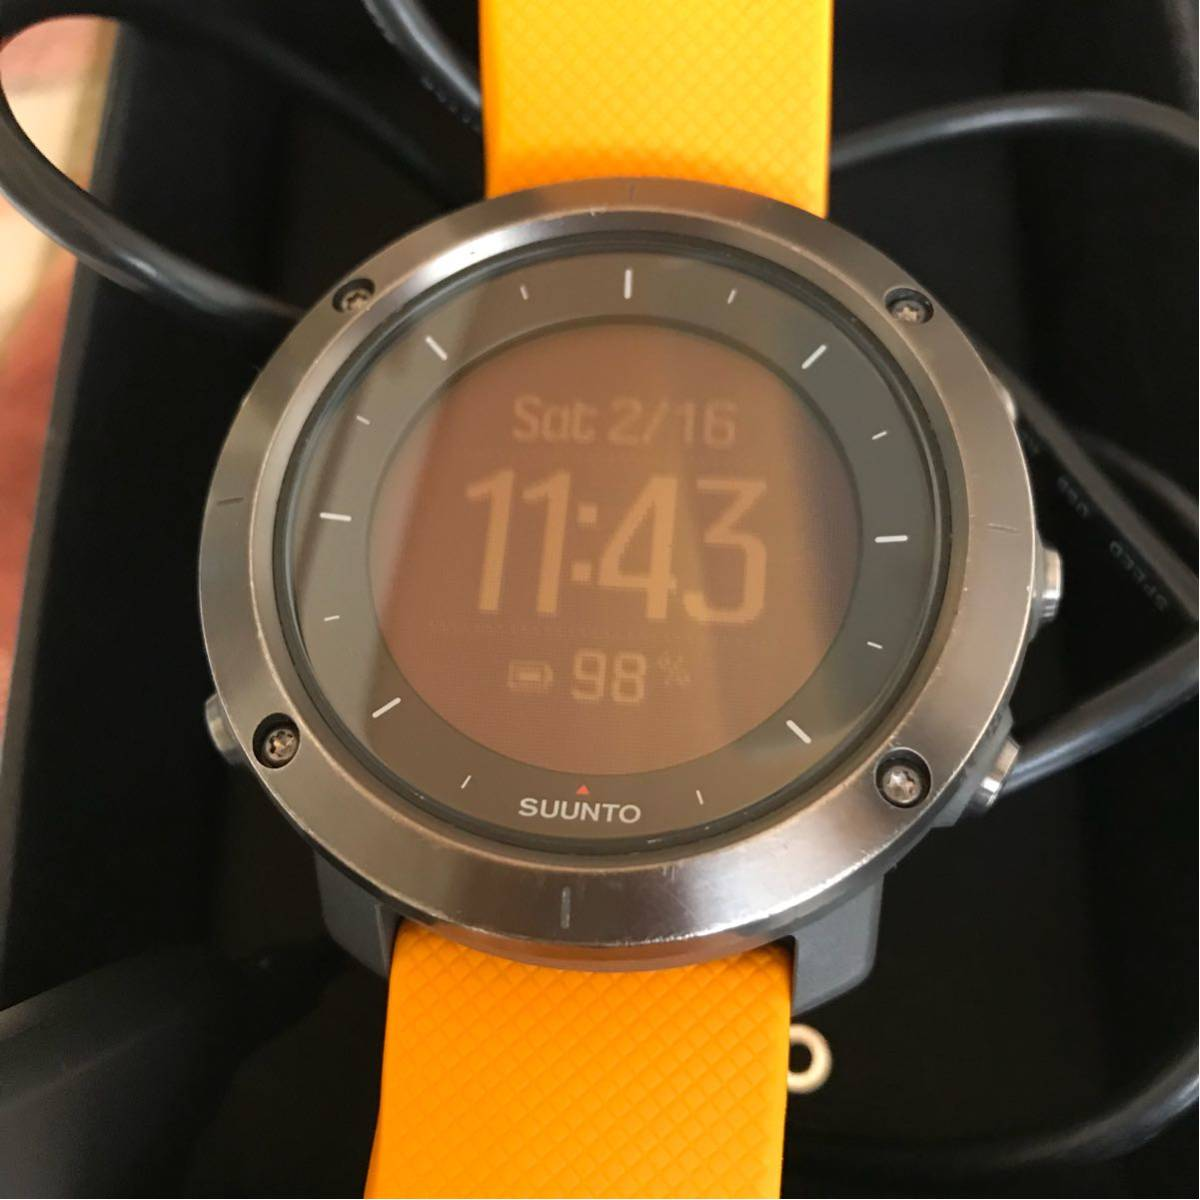 635c9b478c 代購代標第一品牌- 樂淘letao - Suunto Traverse Amber GPSナビ気圧計電子コンパスミルスペック即決スントトラバース アンバー100M防水アウトドア登山充電式